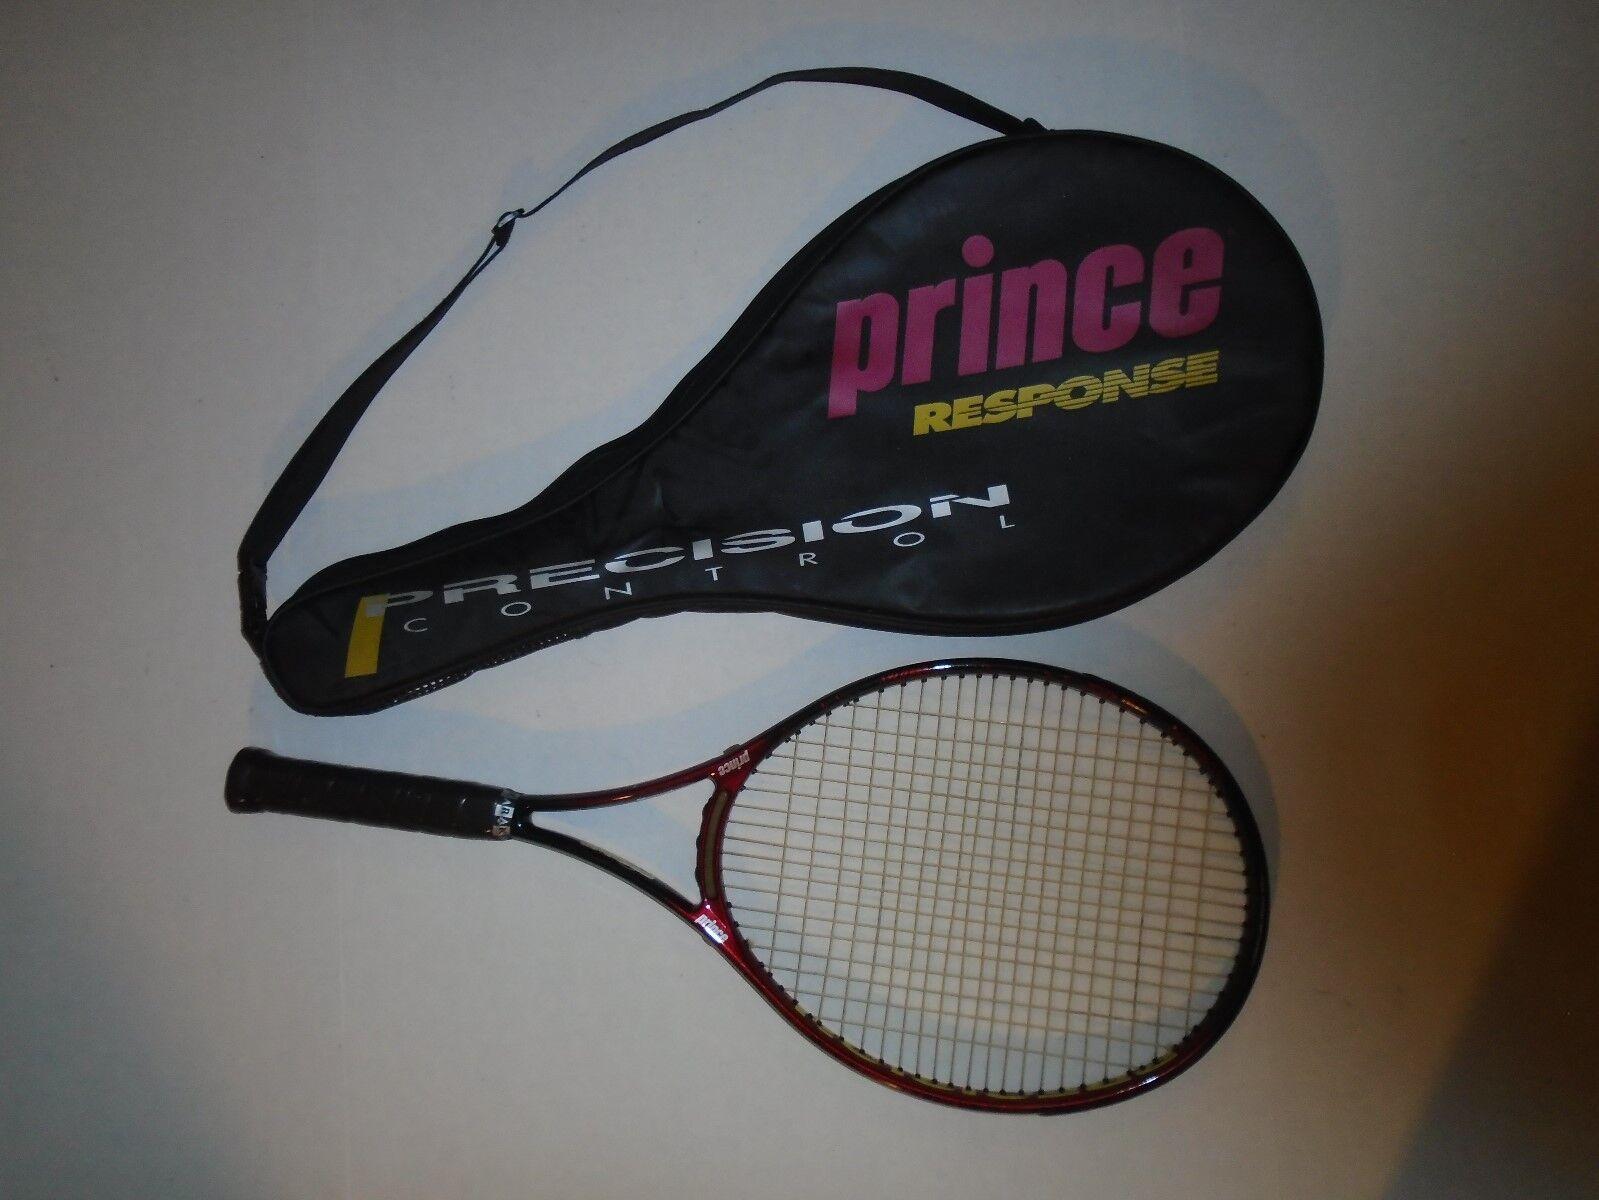 Prince Precision Response OS (107) 710 PL + Case. 4 5 8. NXT. New Grip. VG.